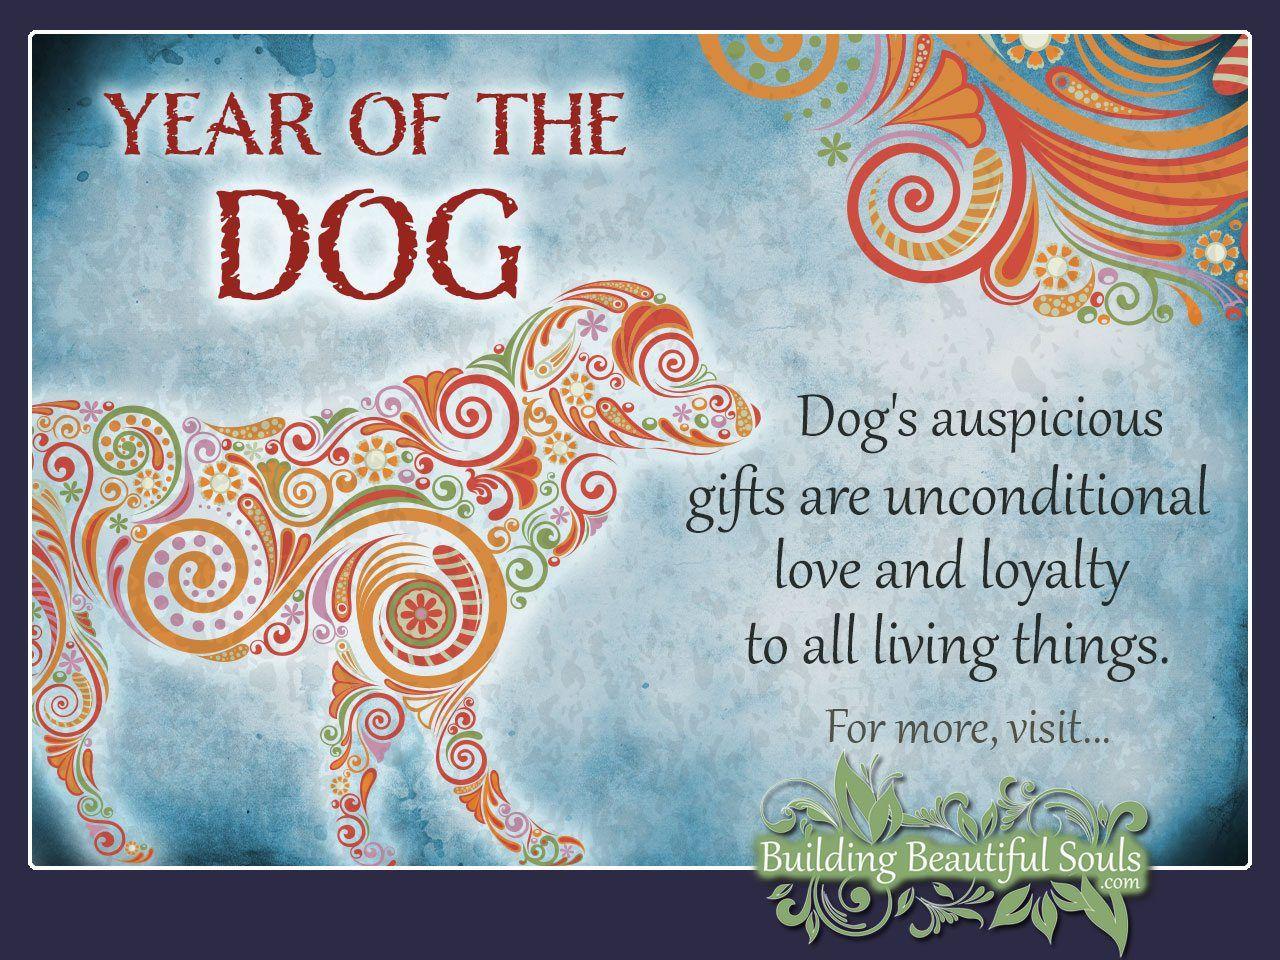 Chinese Zodiac Dog Dog years, Chinese zodiac signs, Dog